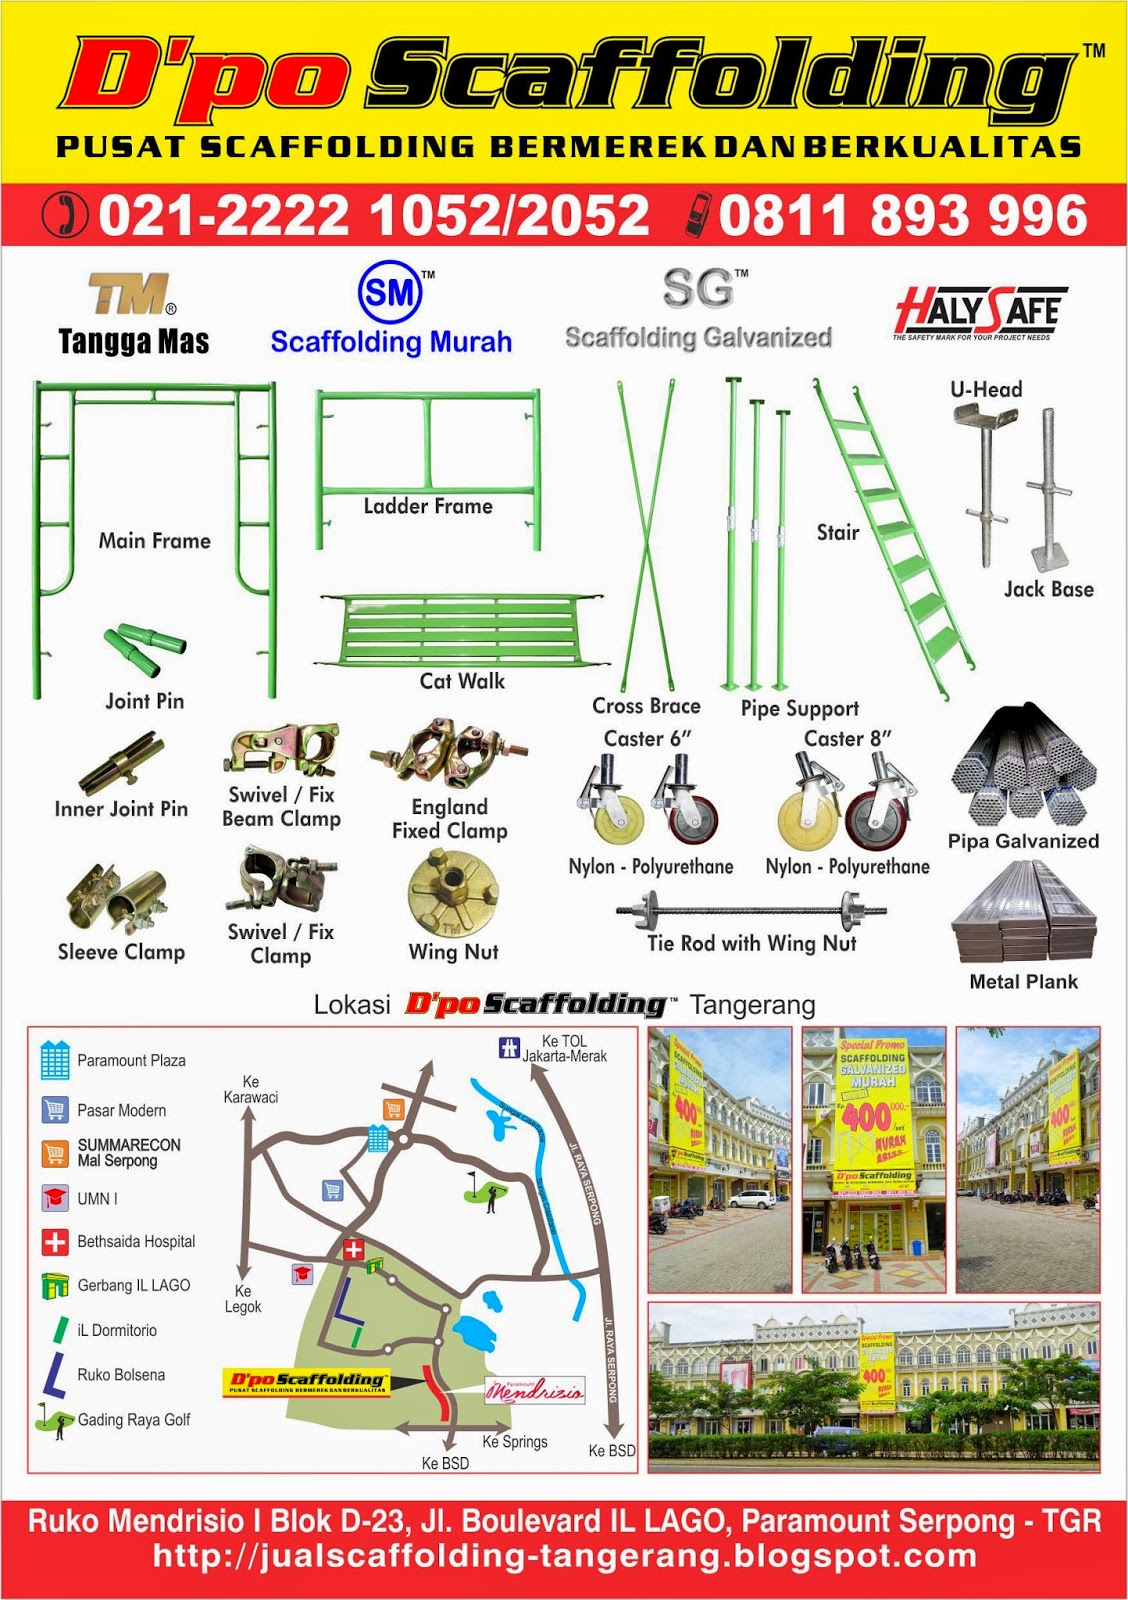 Jual Scaffolding Tangerang, Sewa Scaffolding Tangerang, Rental Scaffolding Tangerang, Scaffolding di Tangerang, Jual Scaffolding di Tangerang, Jual Steger Tangerang, Scaffolding Murah Tangerang, Scaffolding Tangerang